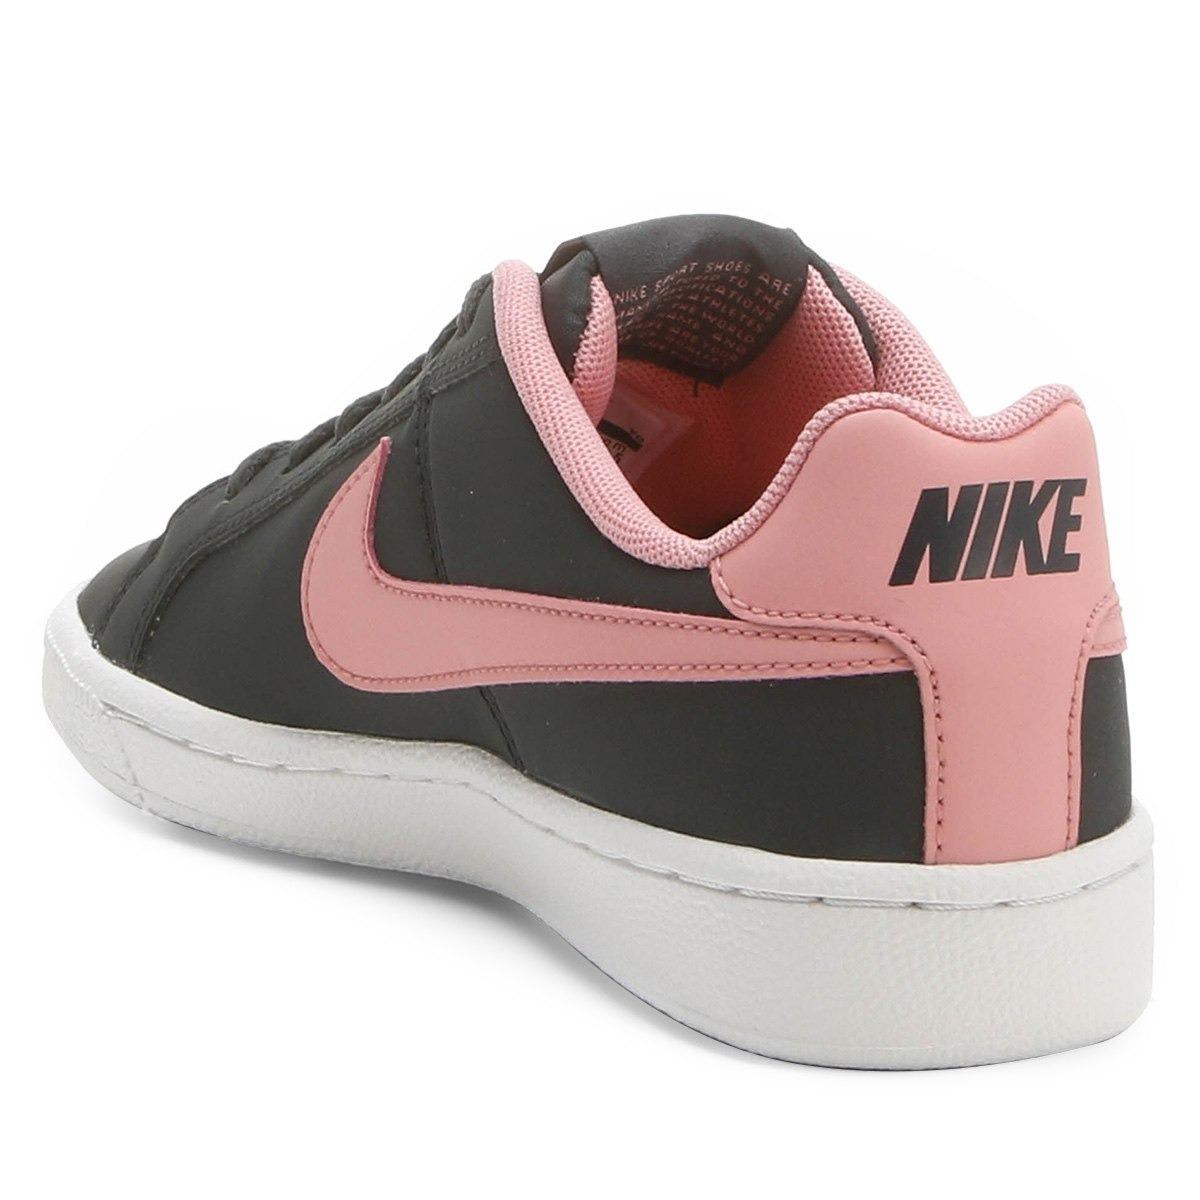 4045cbaa4ed Tenis Nike Court Royale Feminino - Original Nike - R  219